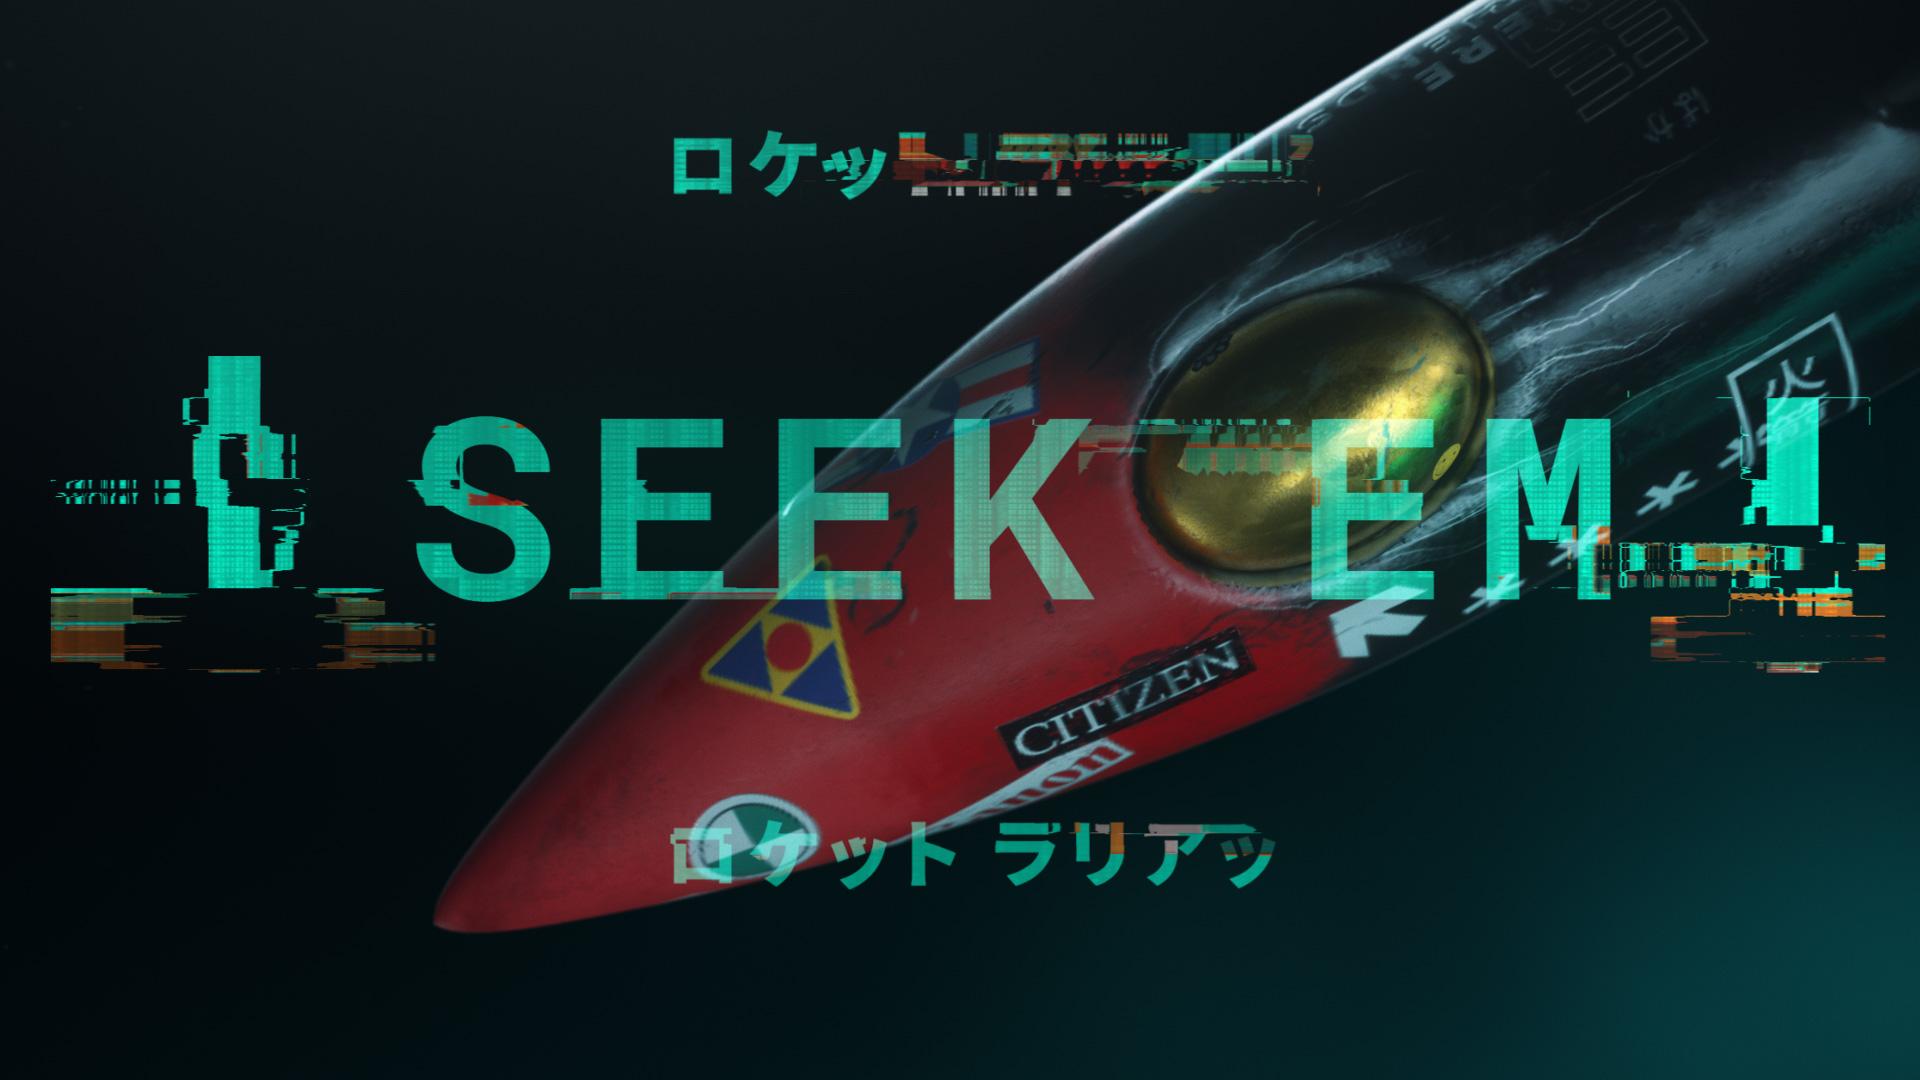 Seek 'Em